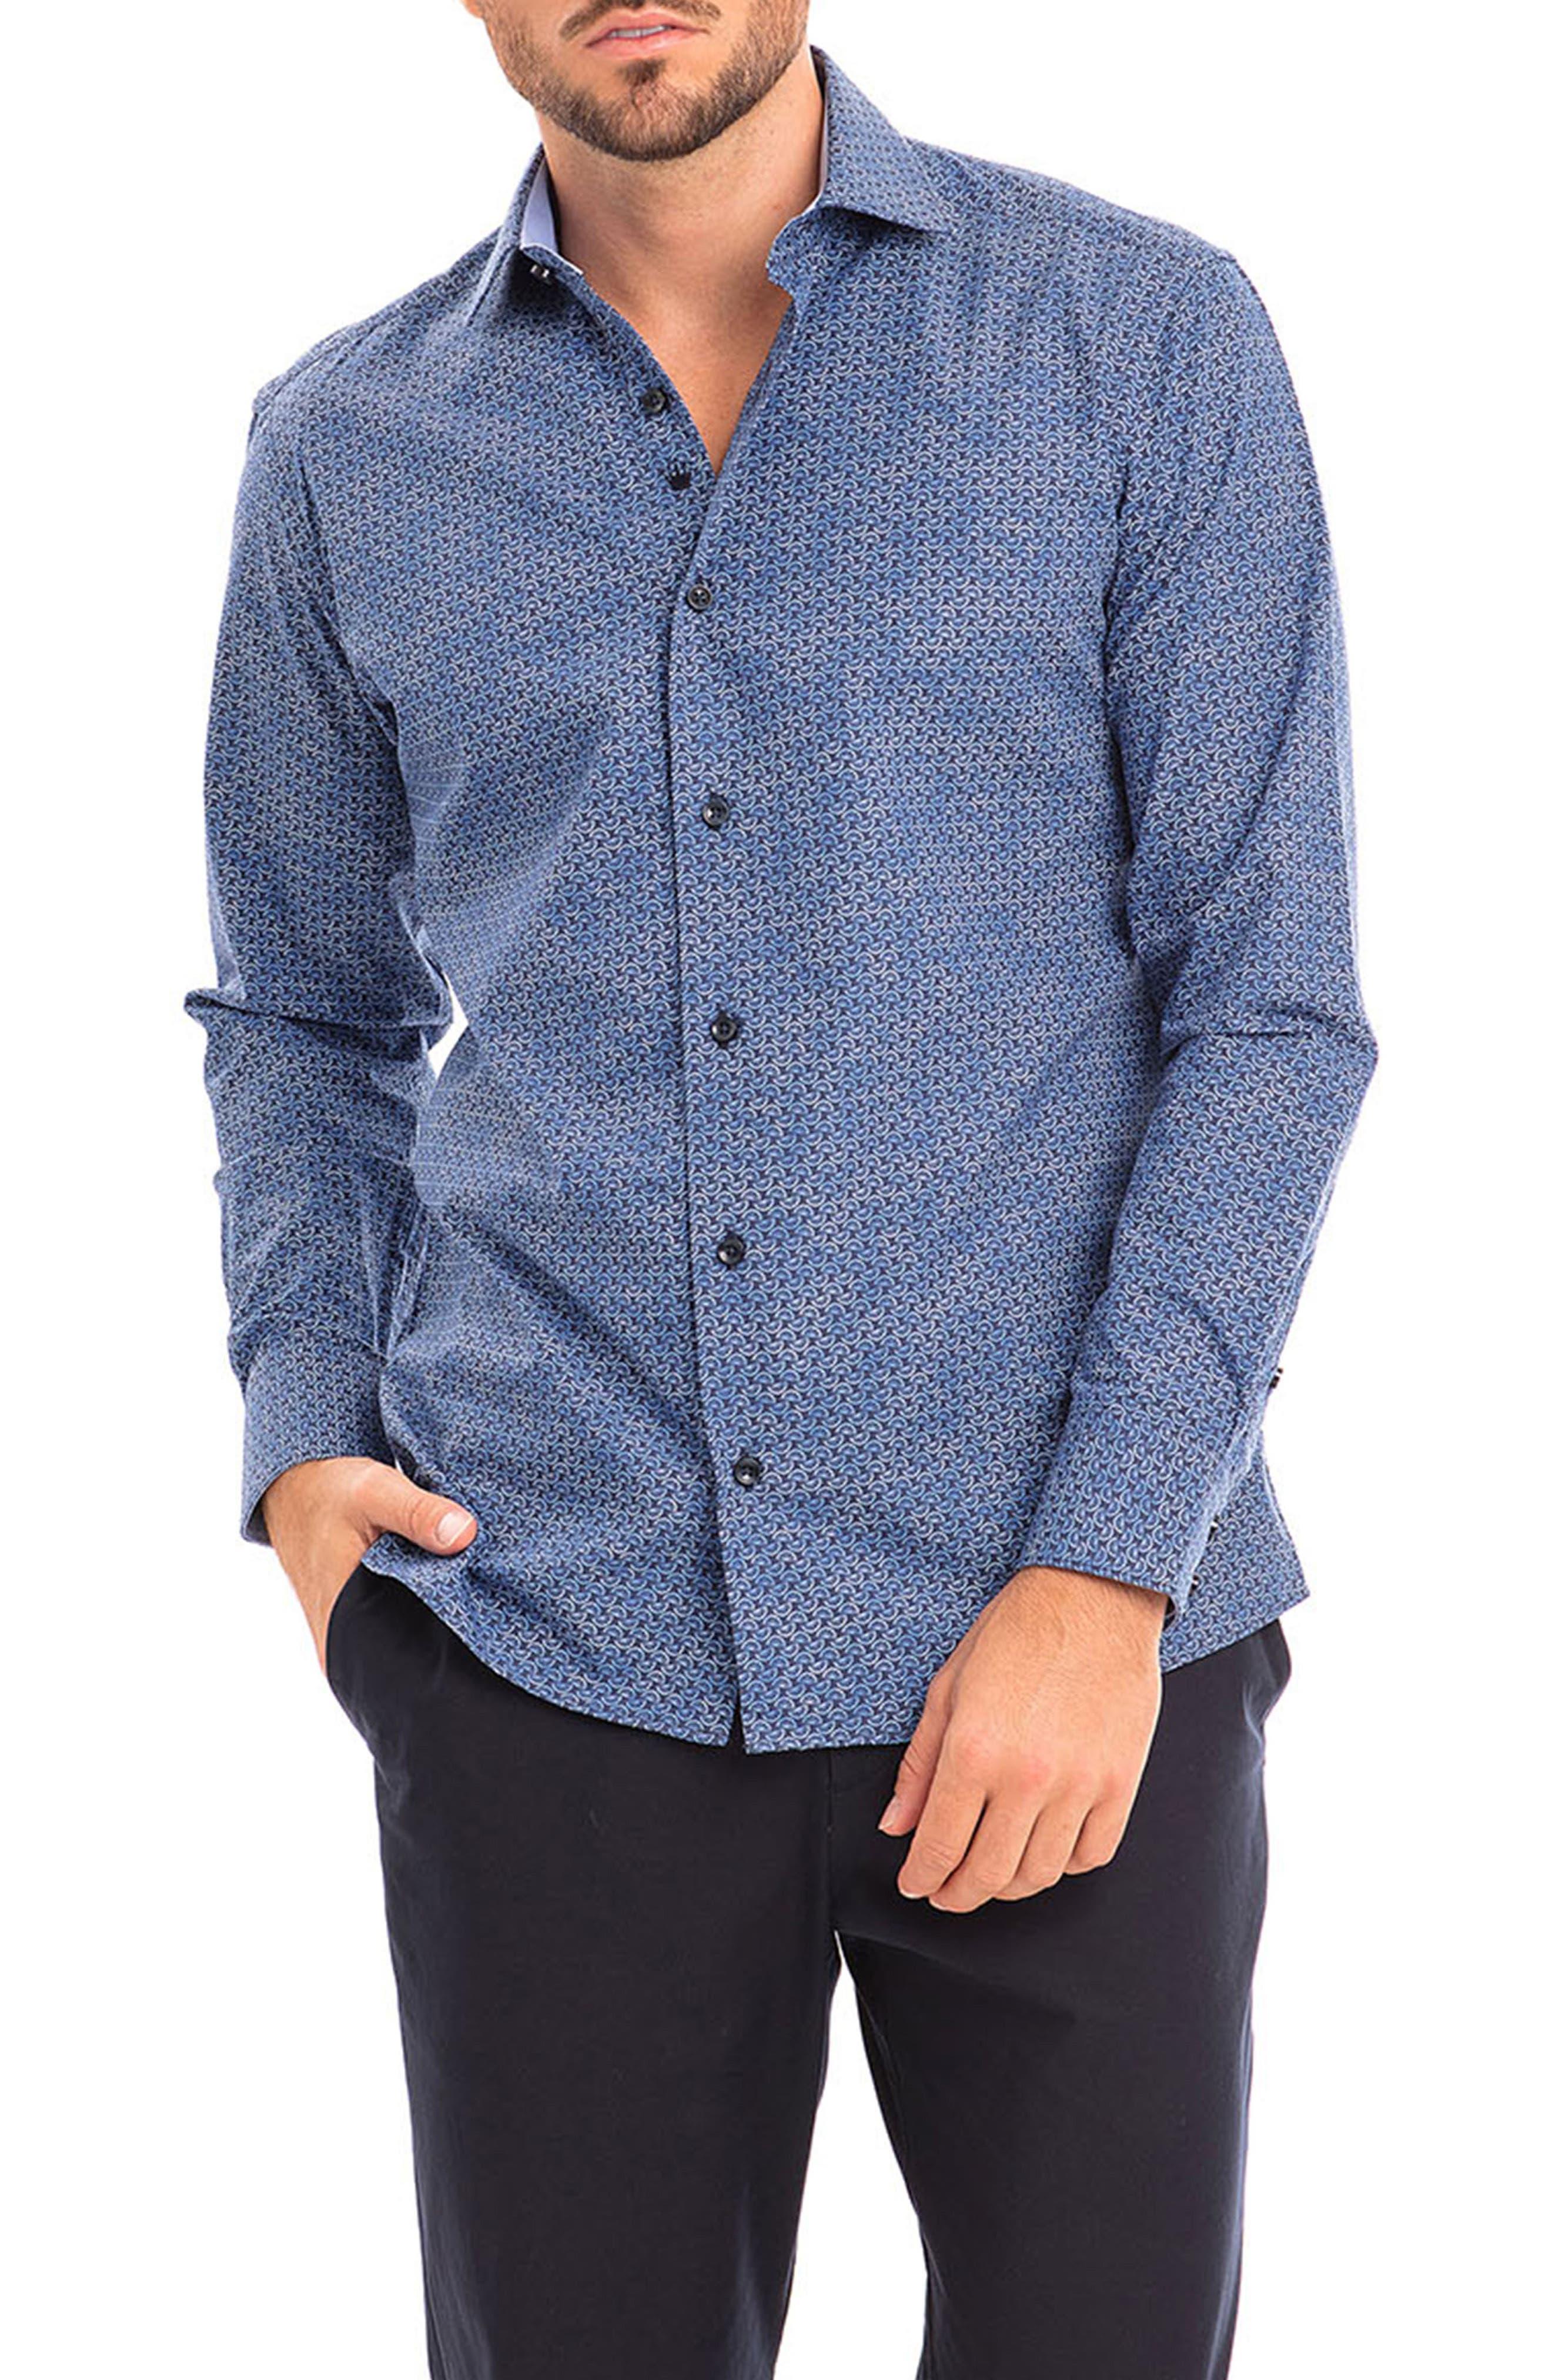 Rivaldo Slim Fit Geometric Button-Up Shirt